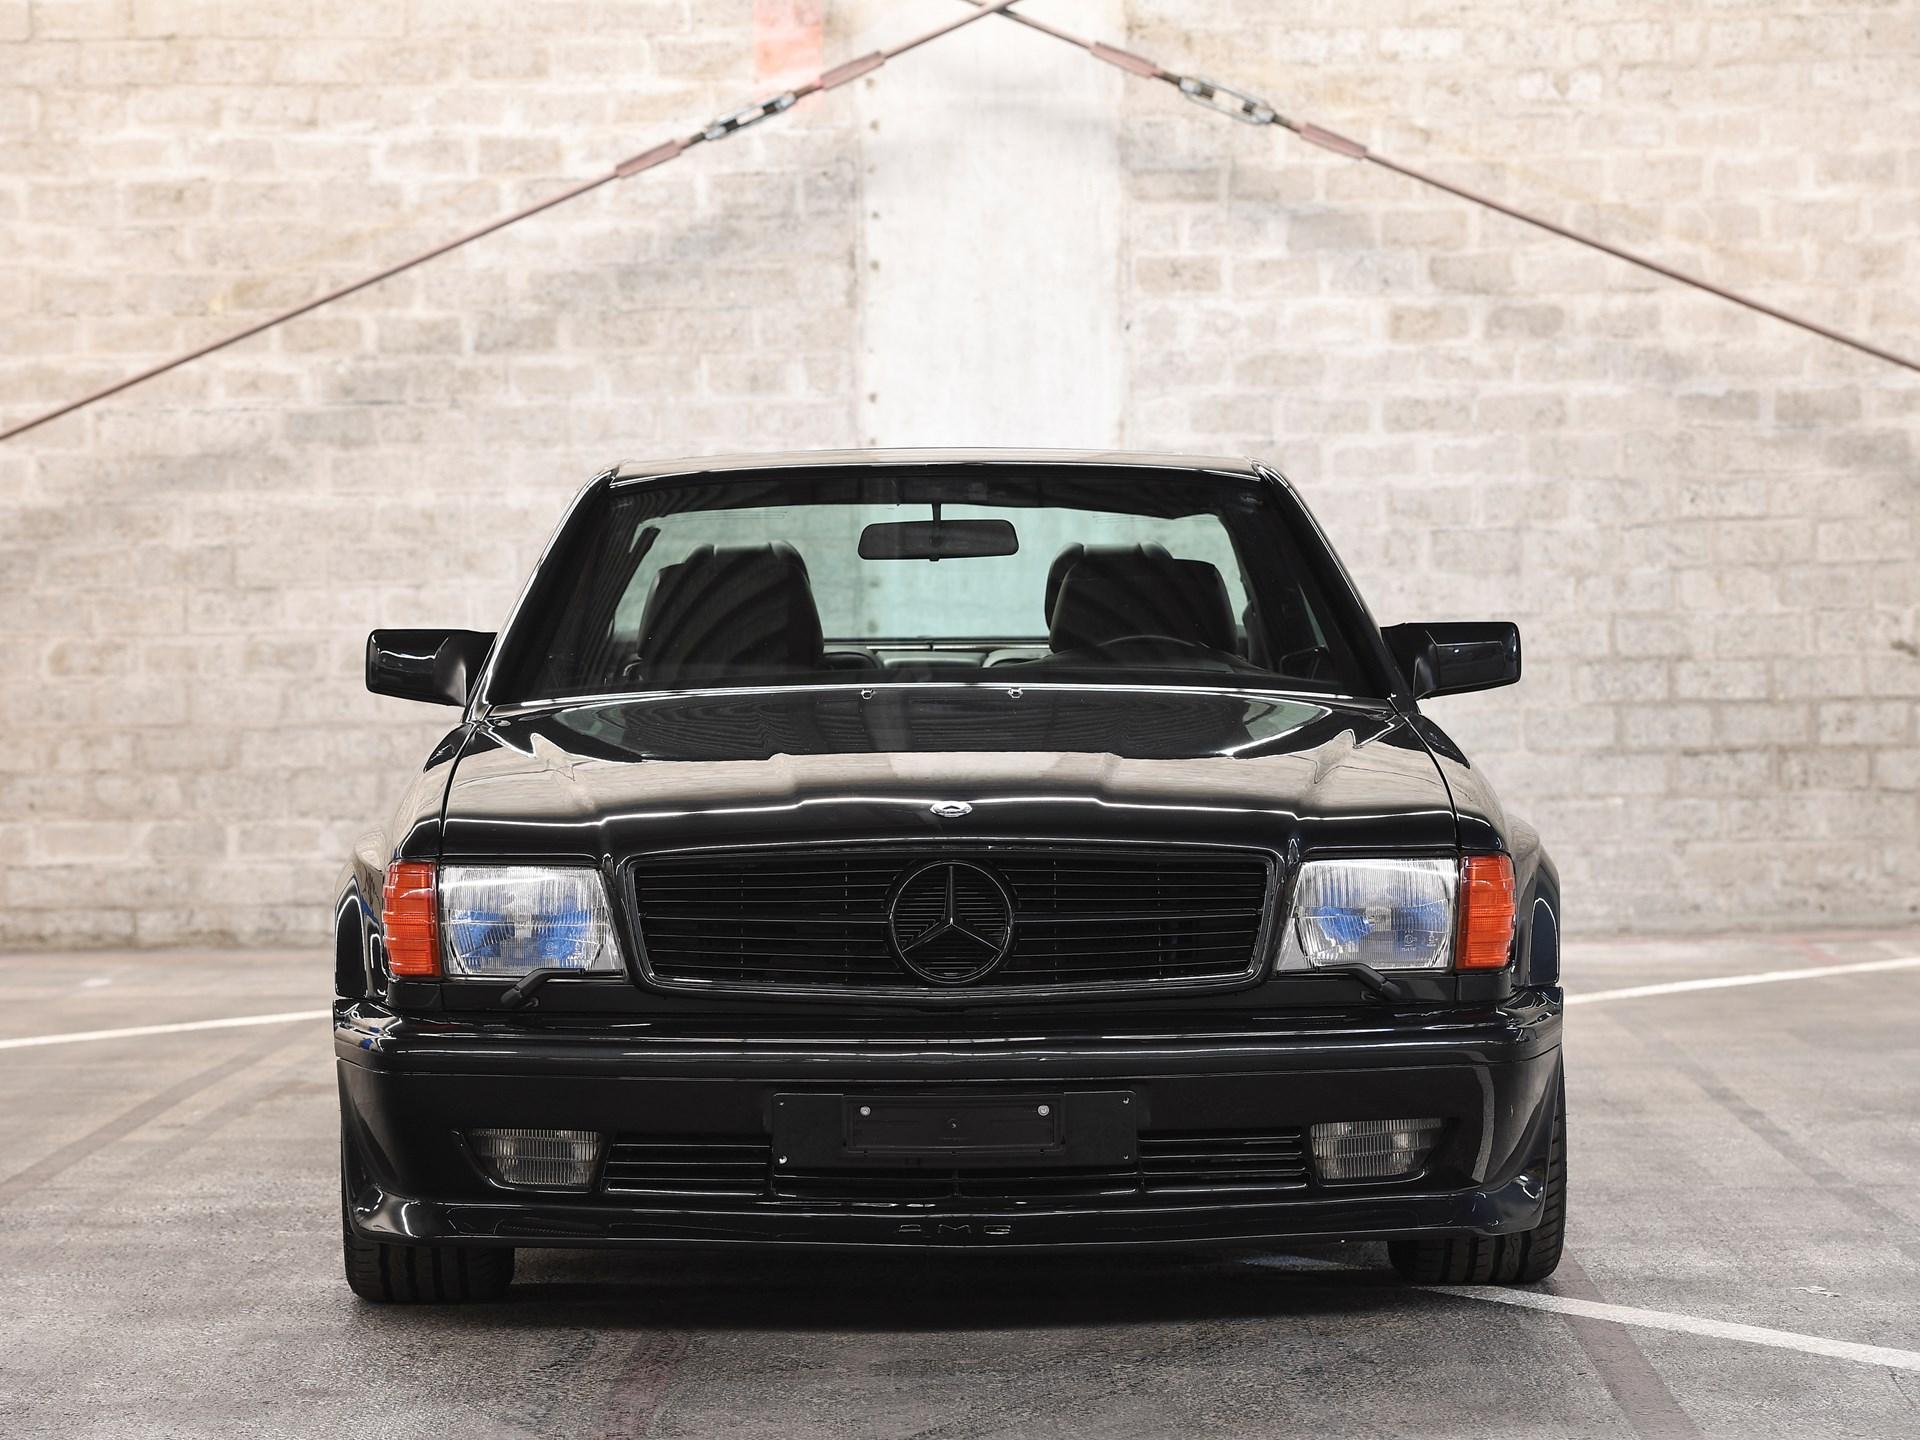 rm sotheby 39 s 1989 mercedes benz 560 sec amg 6 0 39 wide body 39 paris 2019. Black Bedroom Furniture Sets. Home Design Ideas